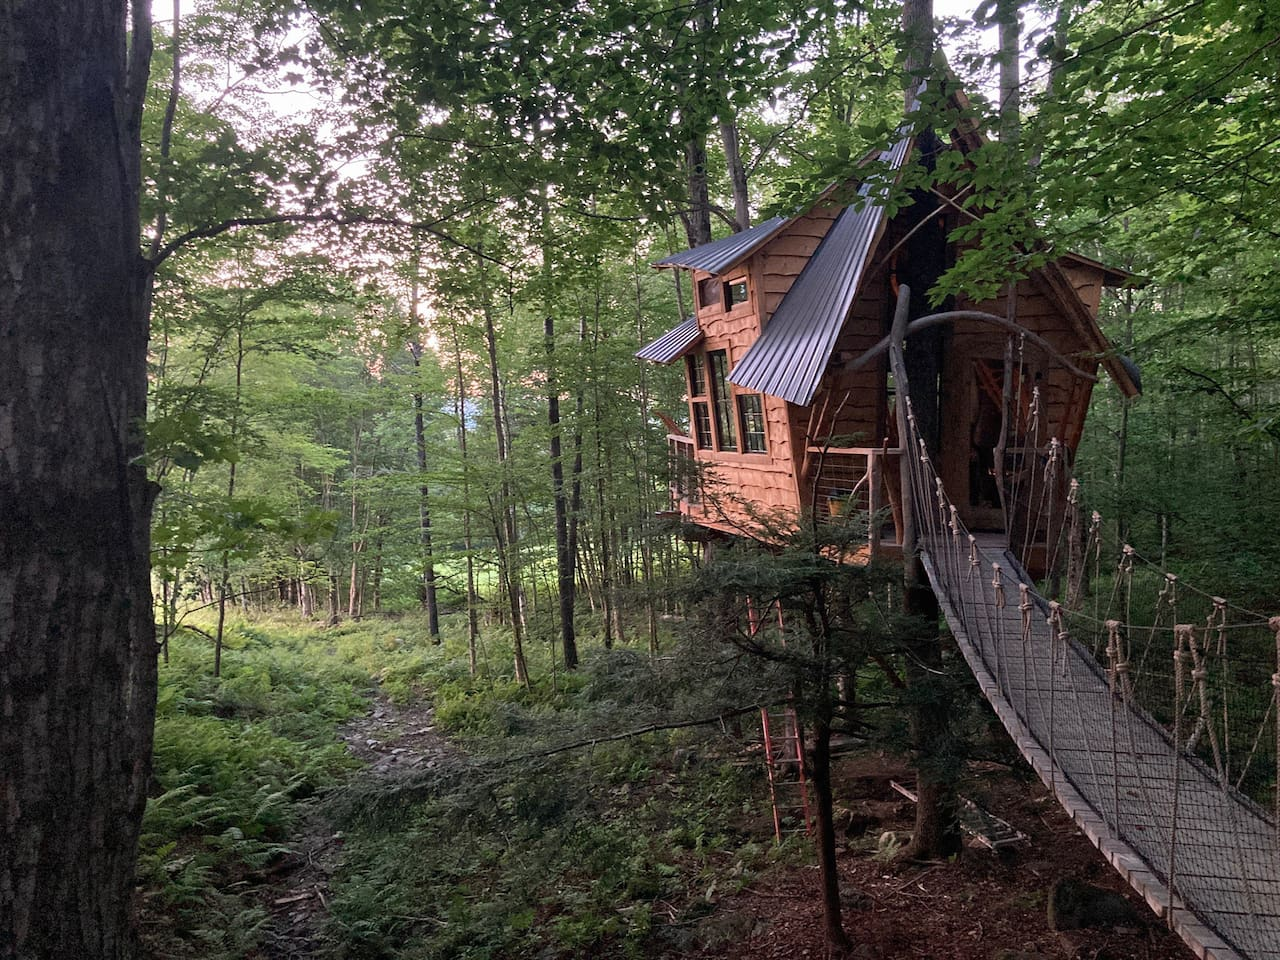 Treehouse at Bliss Ridge Farm - best view in VT